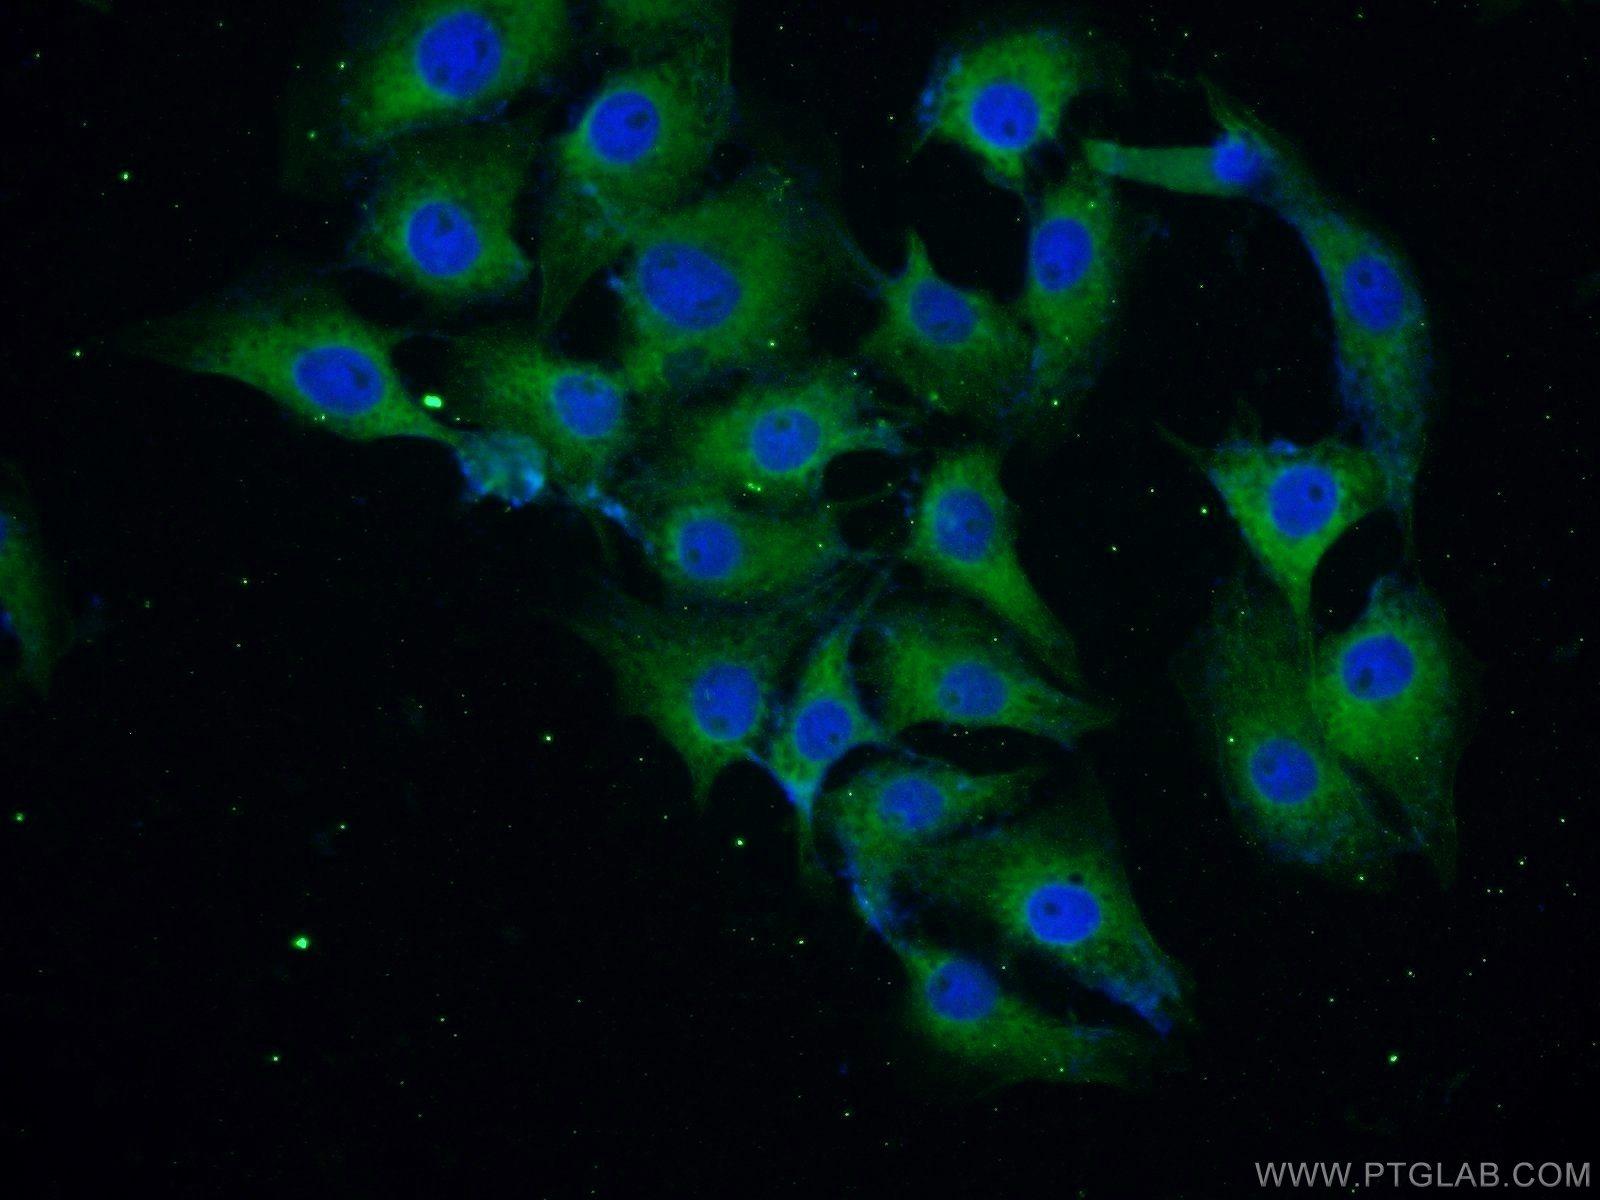 10842-1-AP;SH-SY5Y cells